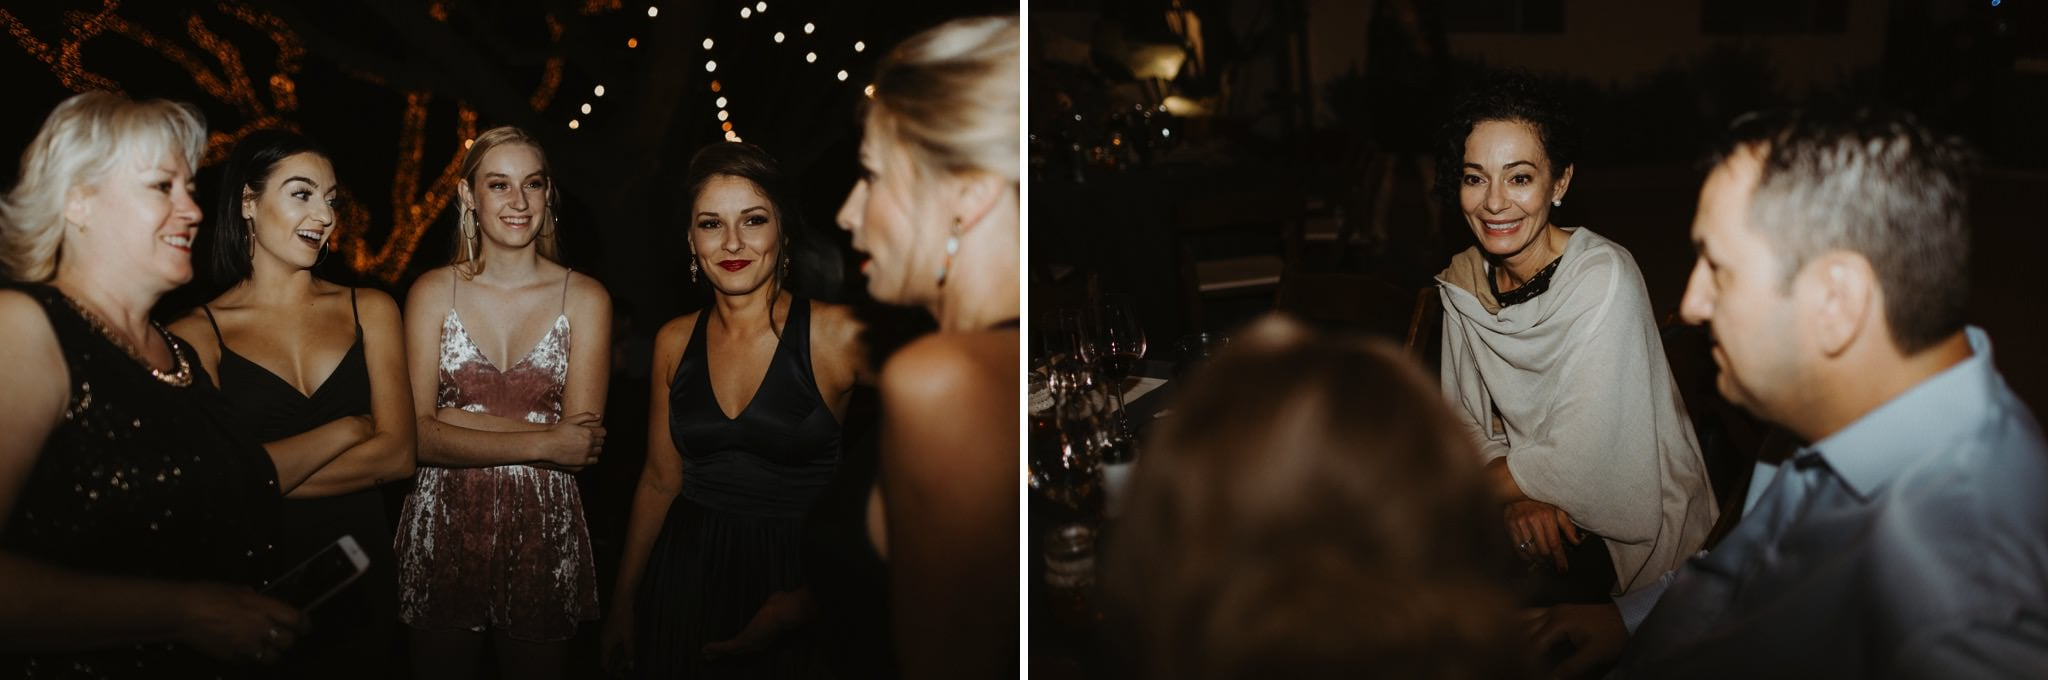 simi valley wedding photography 171